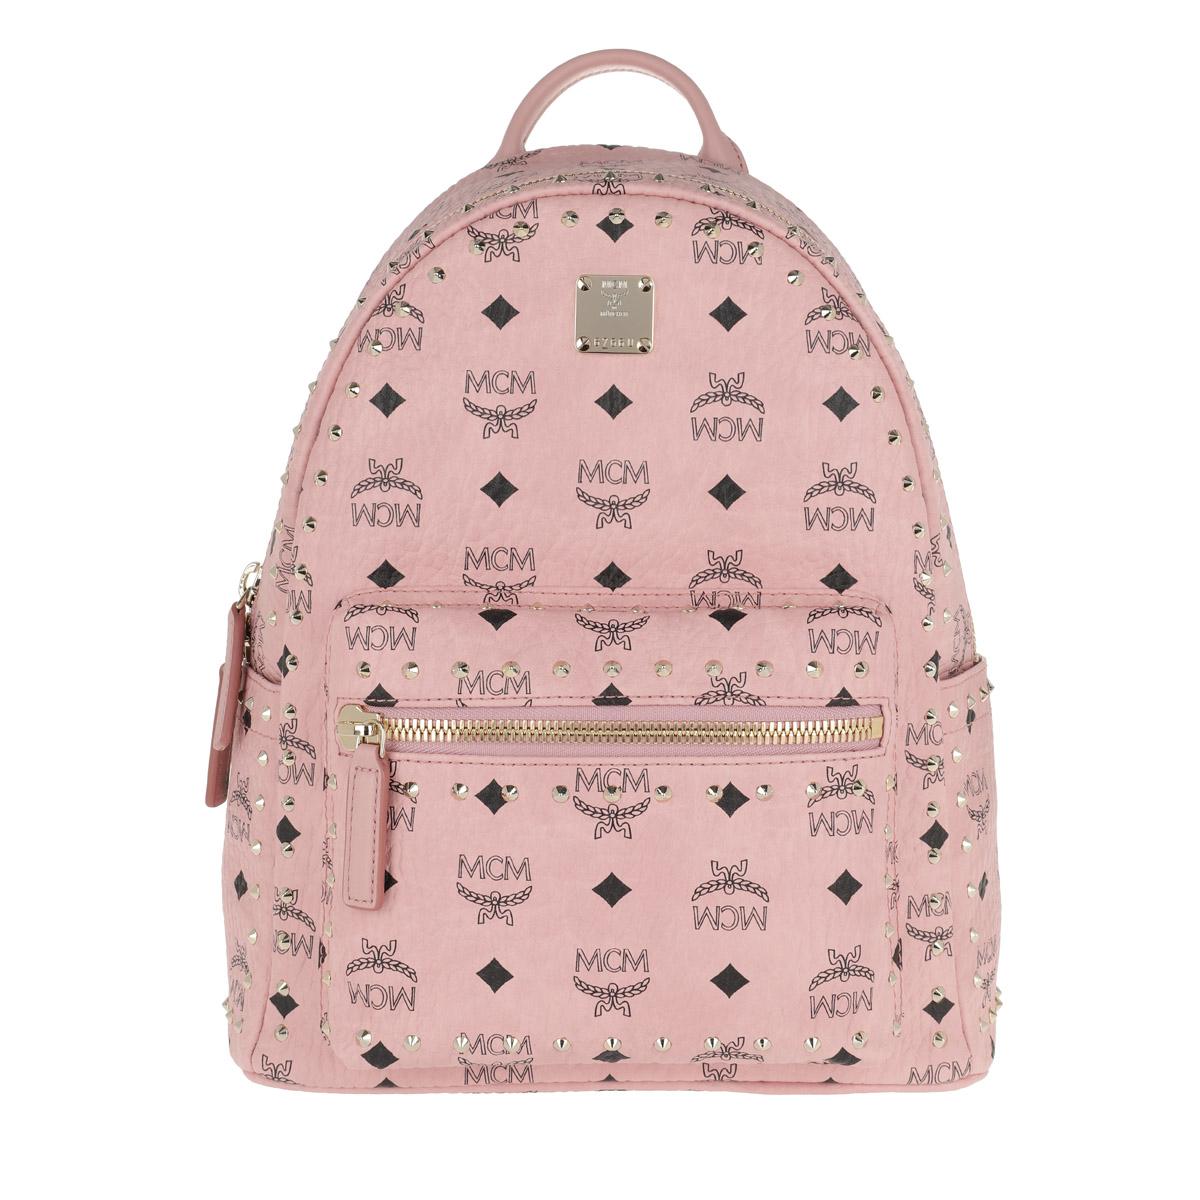 MCM Rucksack Stark Outline Studs Backpack Small Soft Pink in rosa für Damen